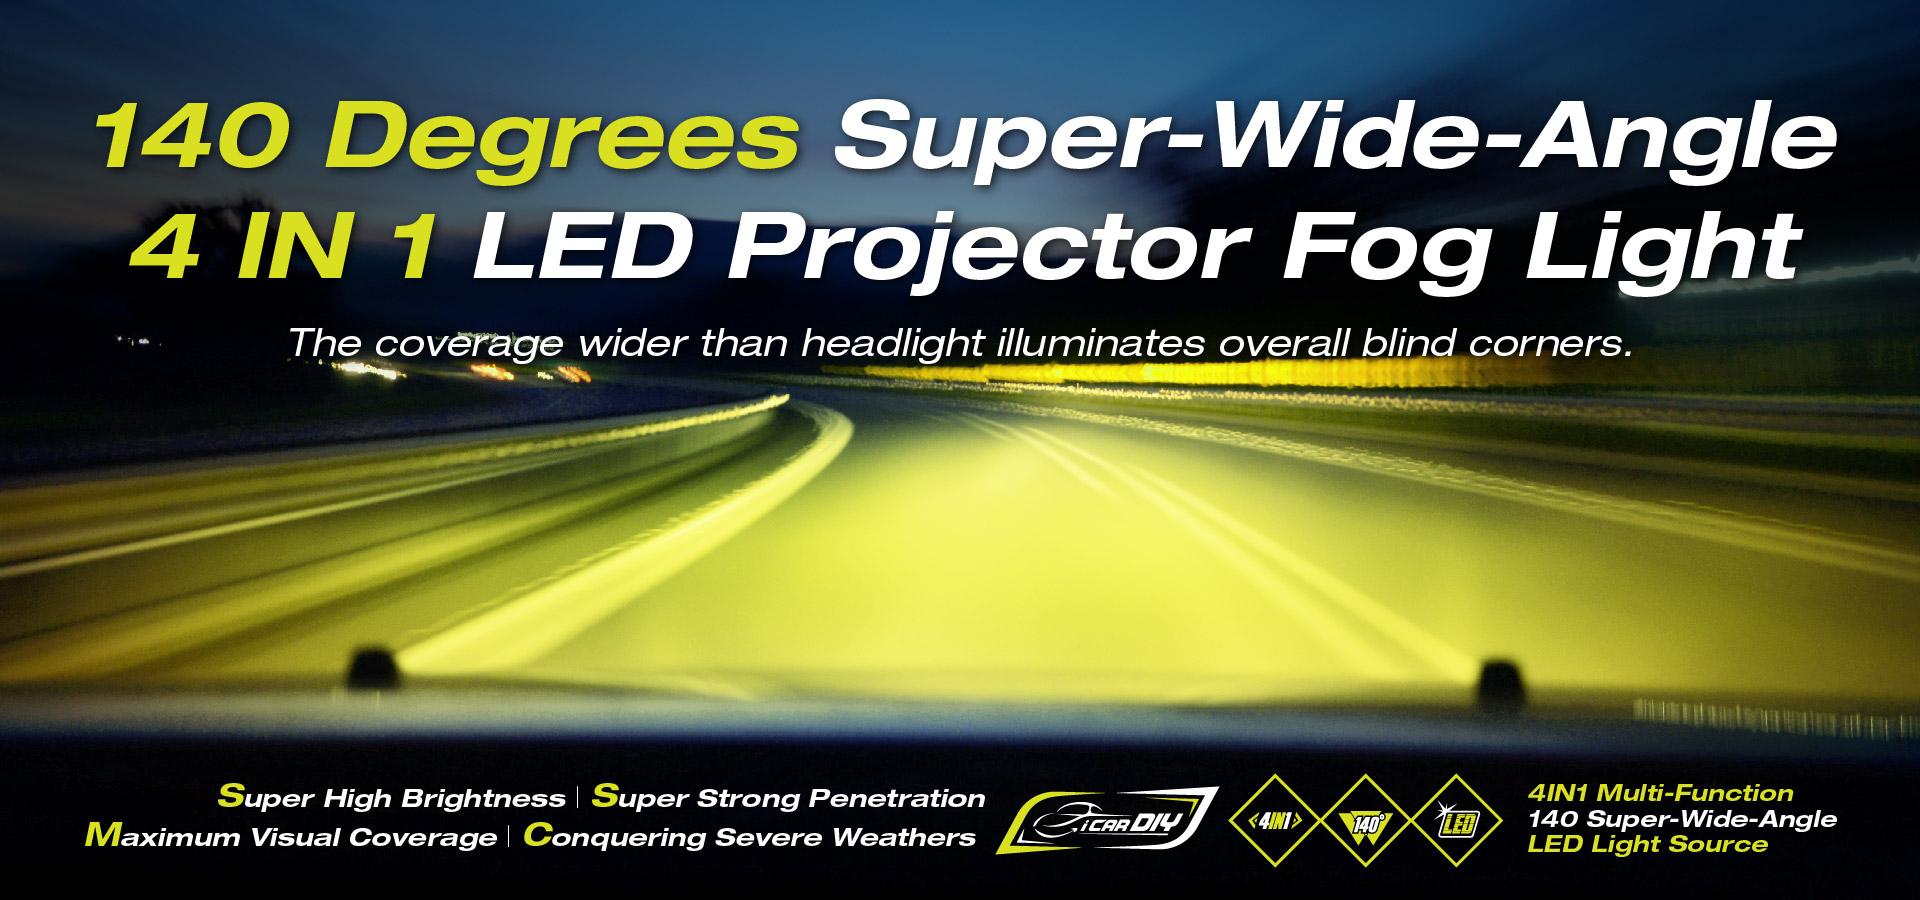 A Super Wide Angle LED Projector Fog Light